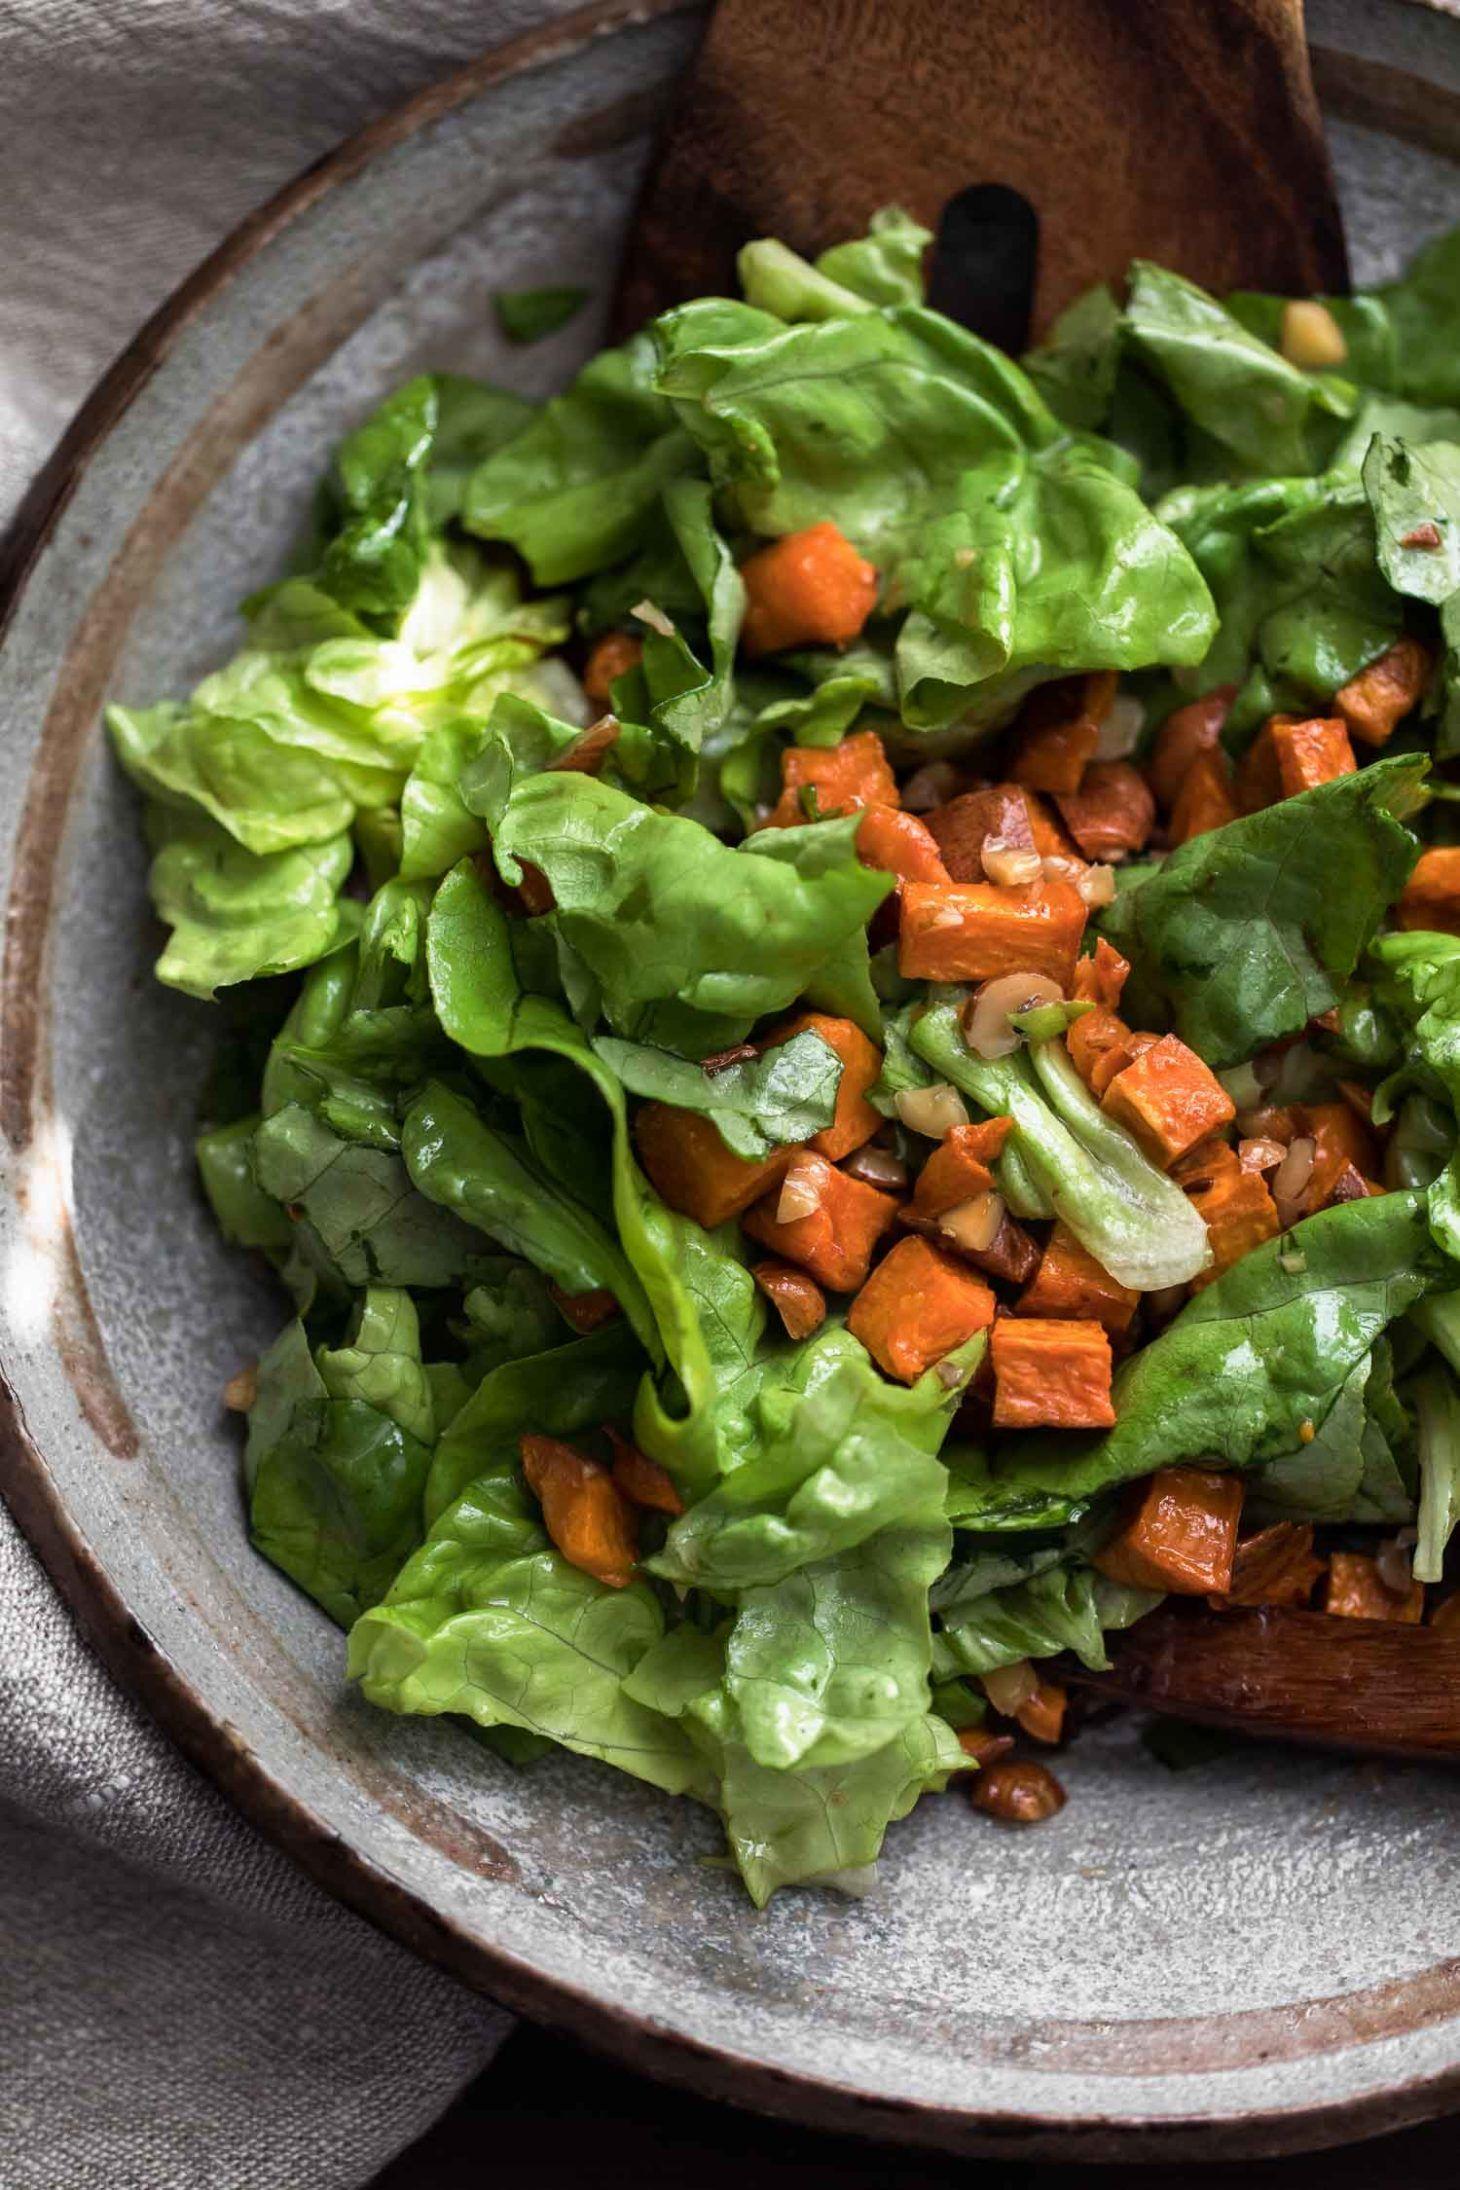 Roasted Sweet Potato Salad with ButterHazelnut Dressing